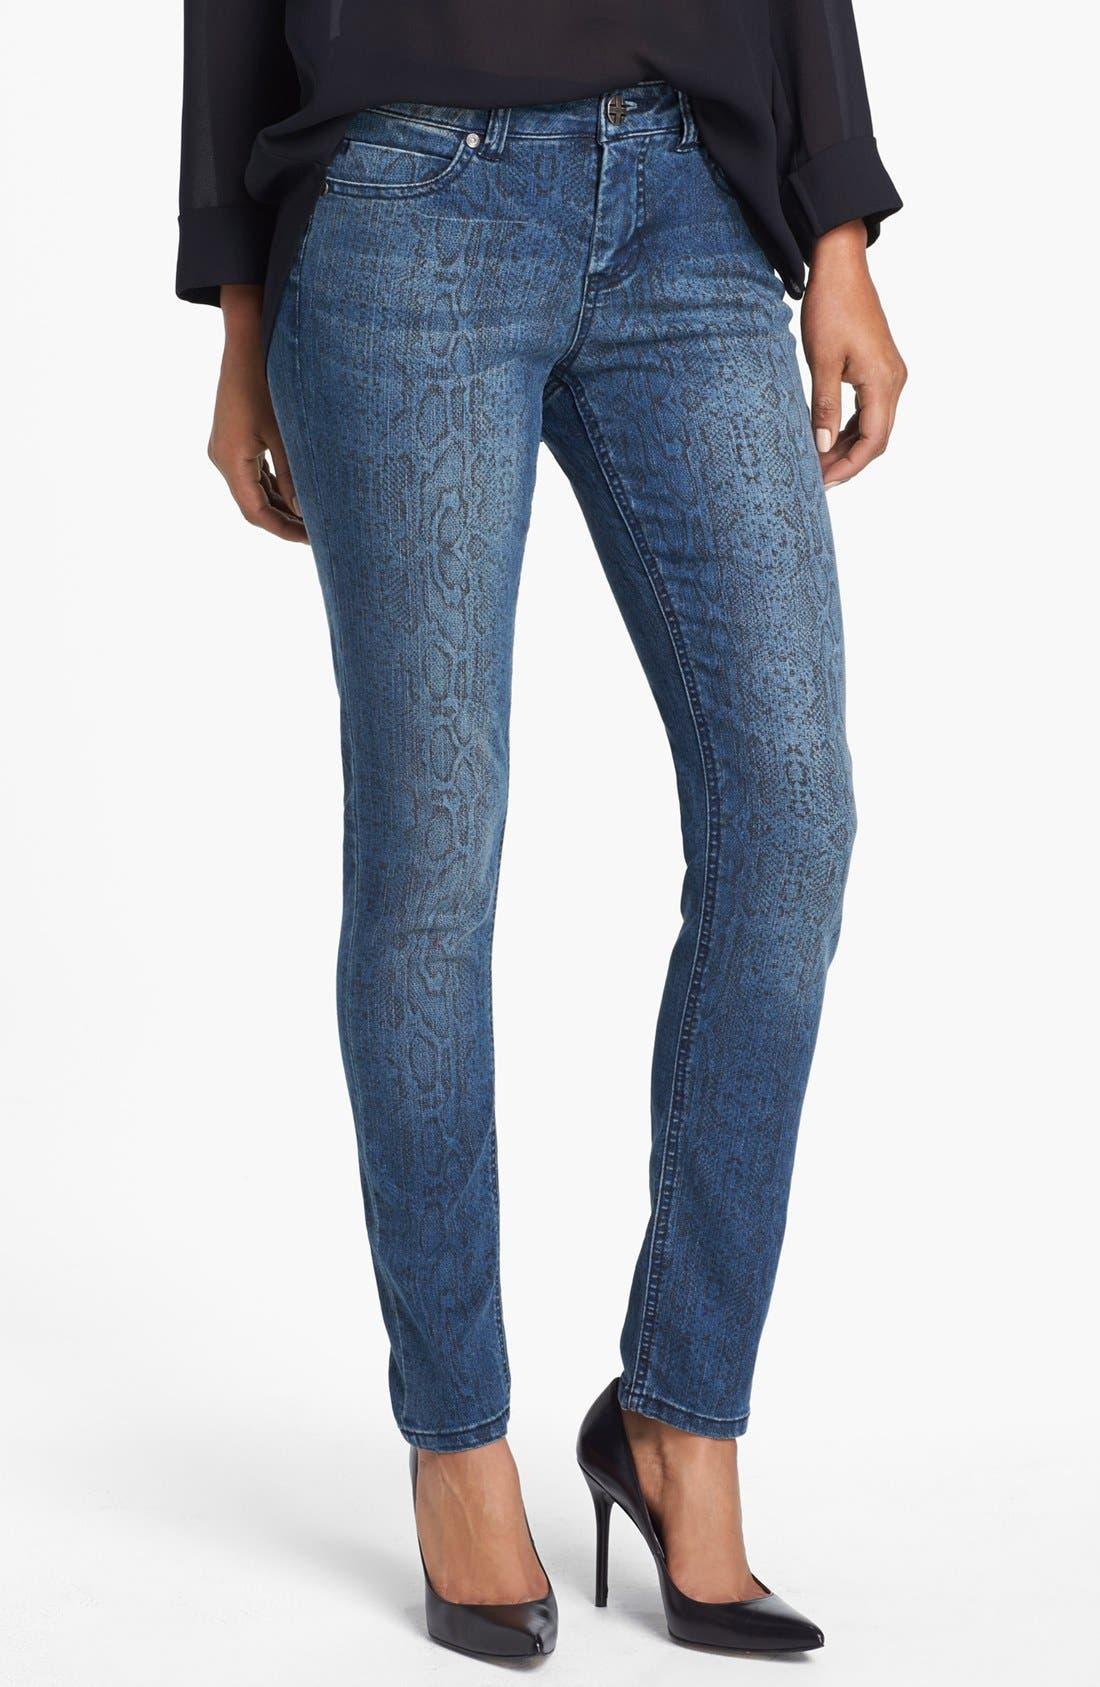 Main Image - Liverpool Jeans Company 'Abby' Print Skinny Jeans